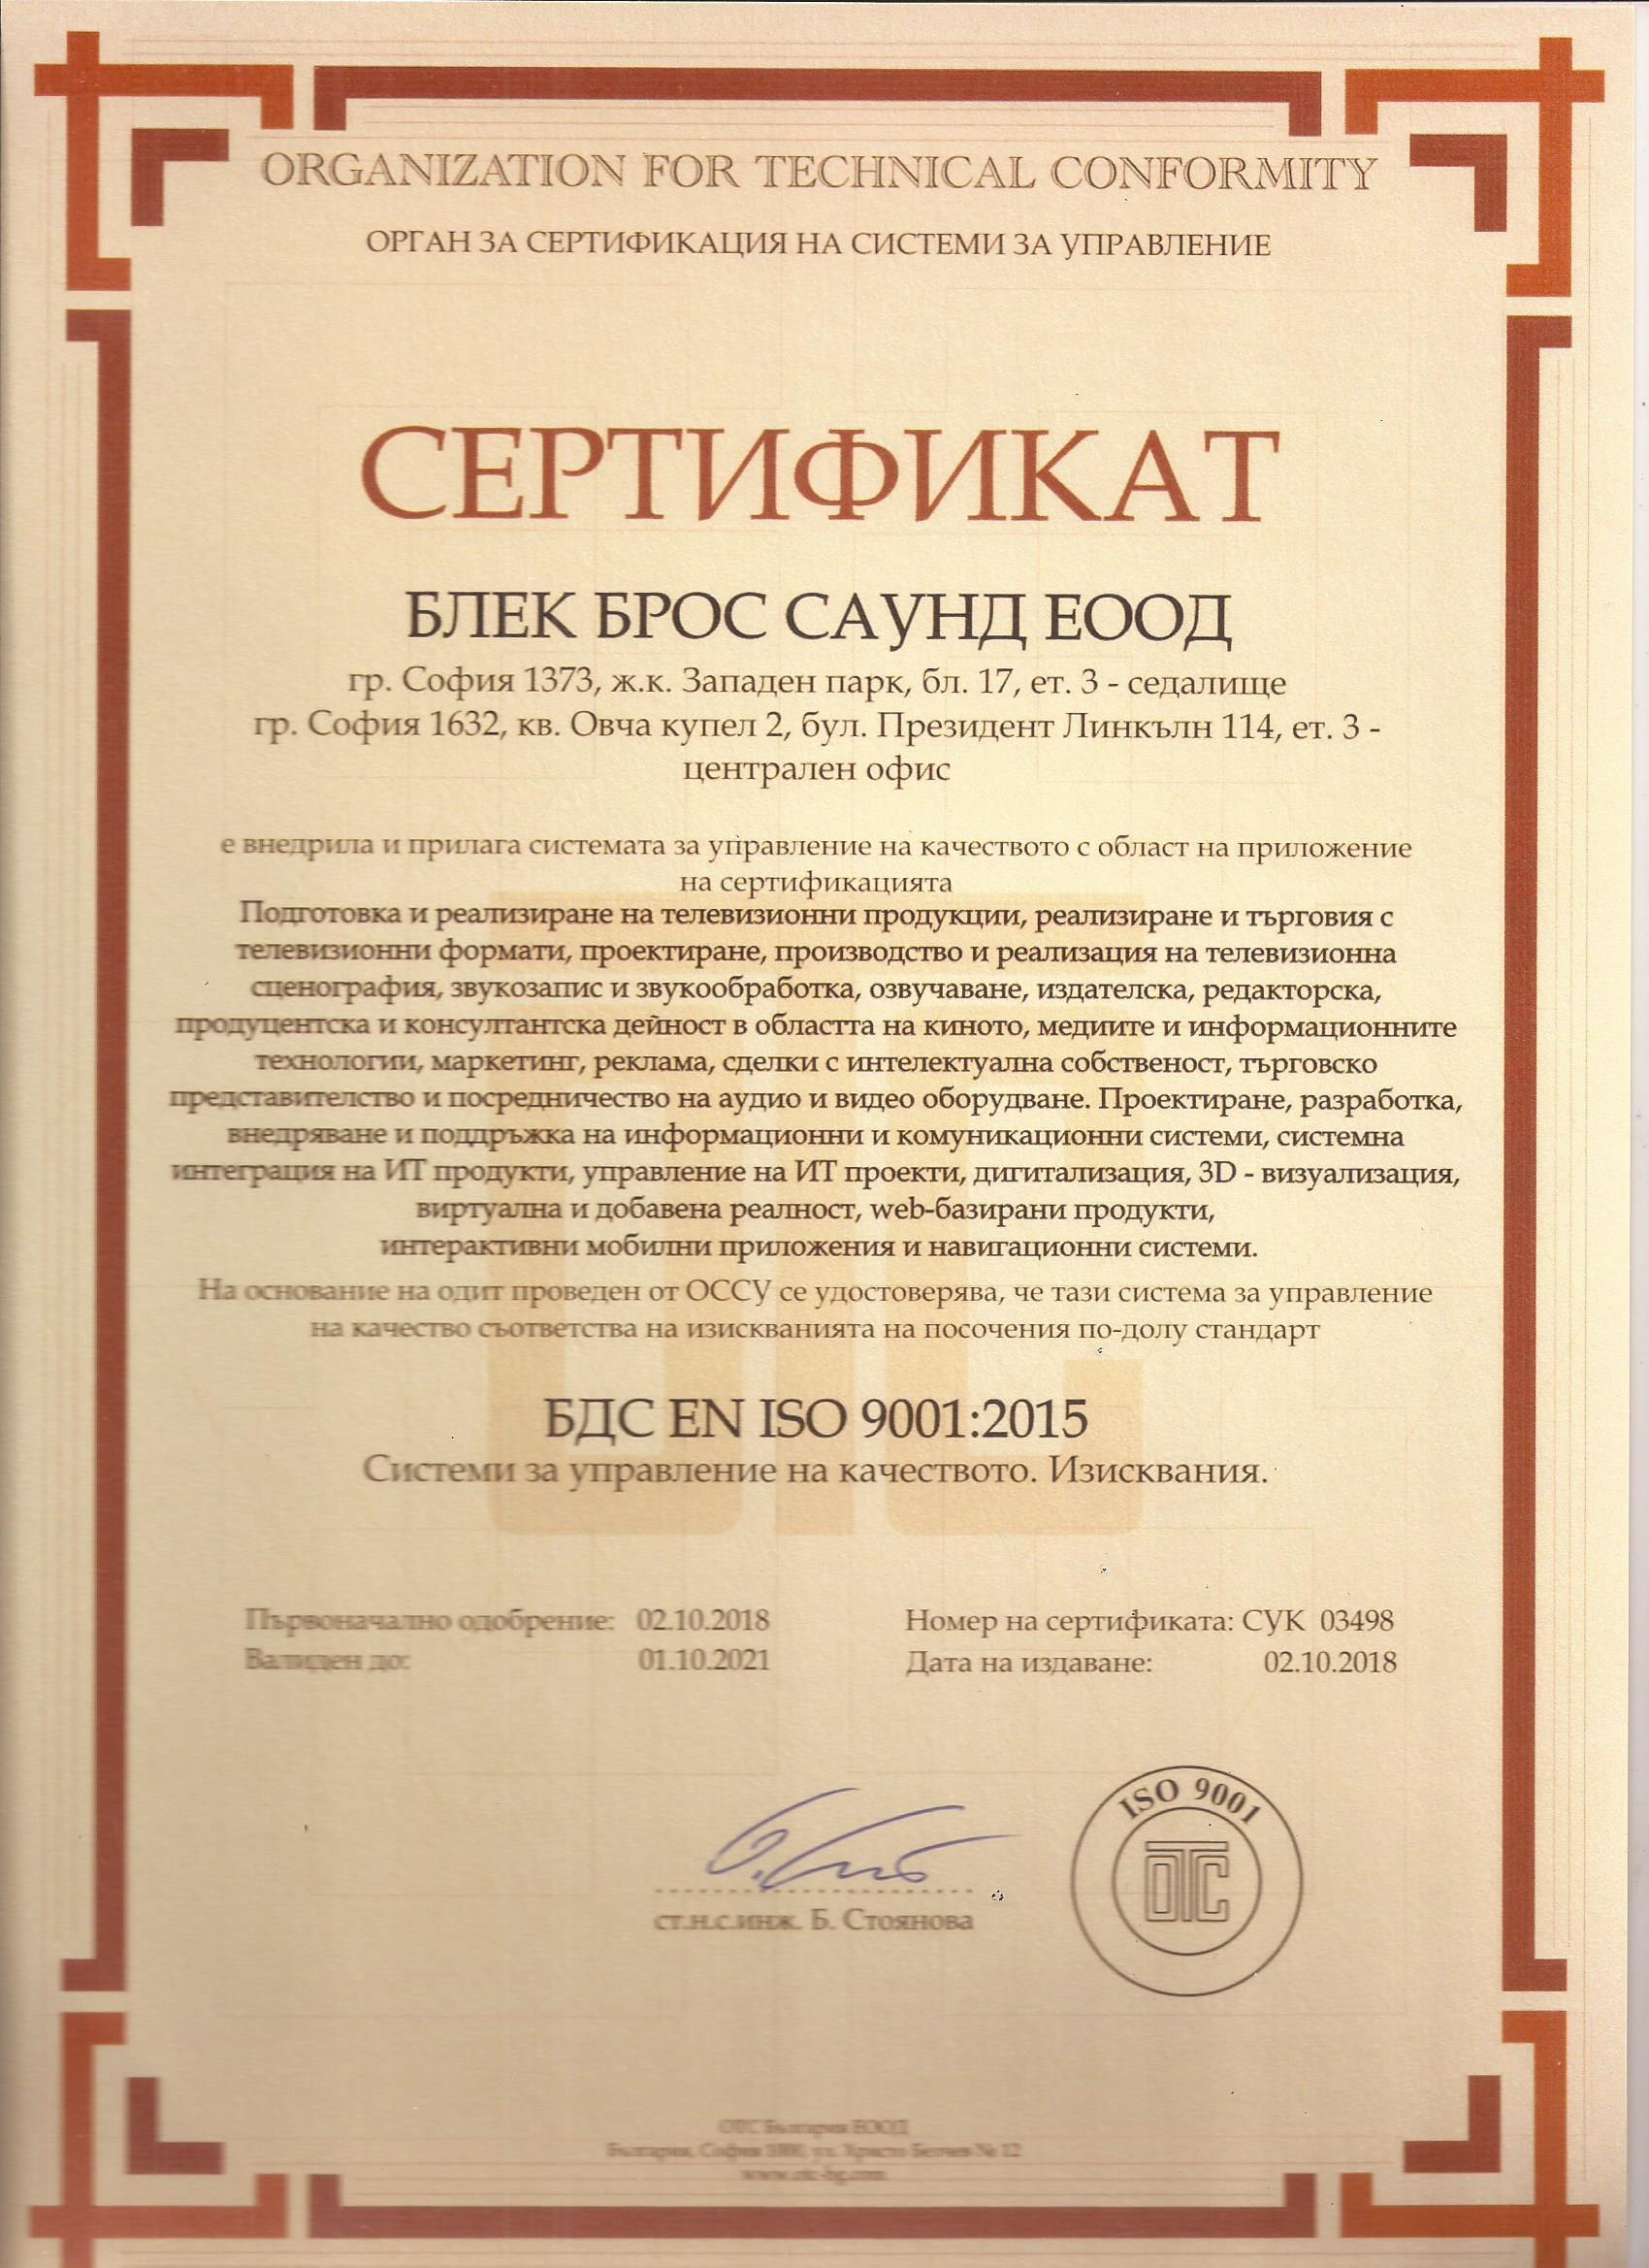 SERTIFIKAT BLACK BROS 9001 BG